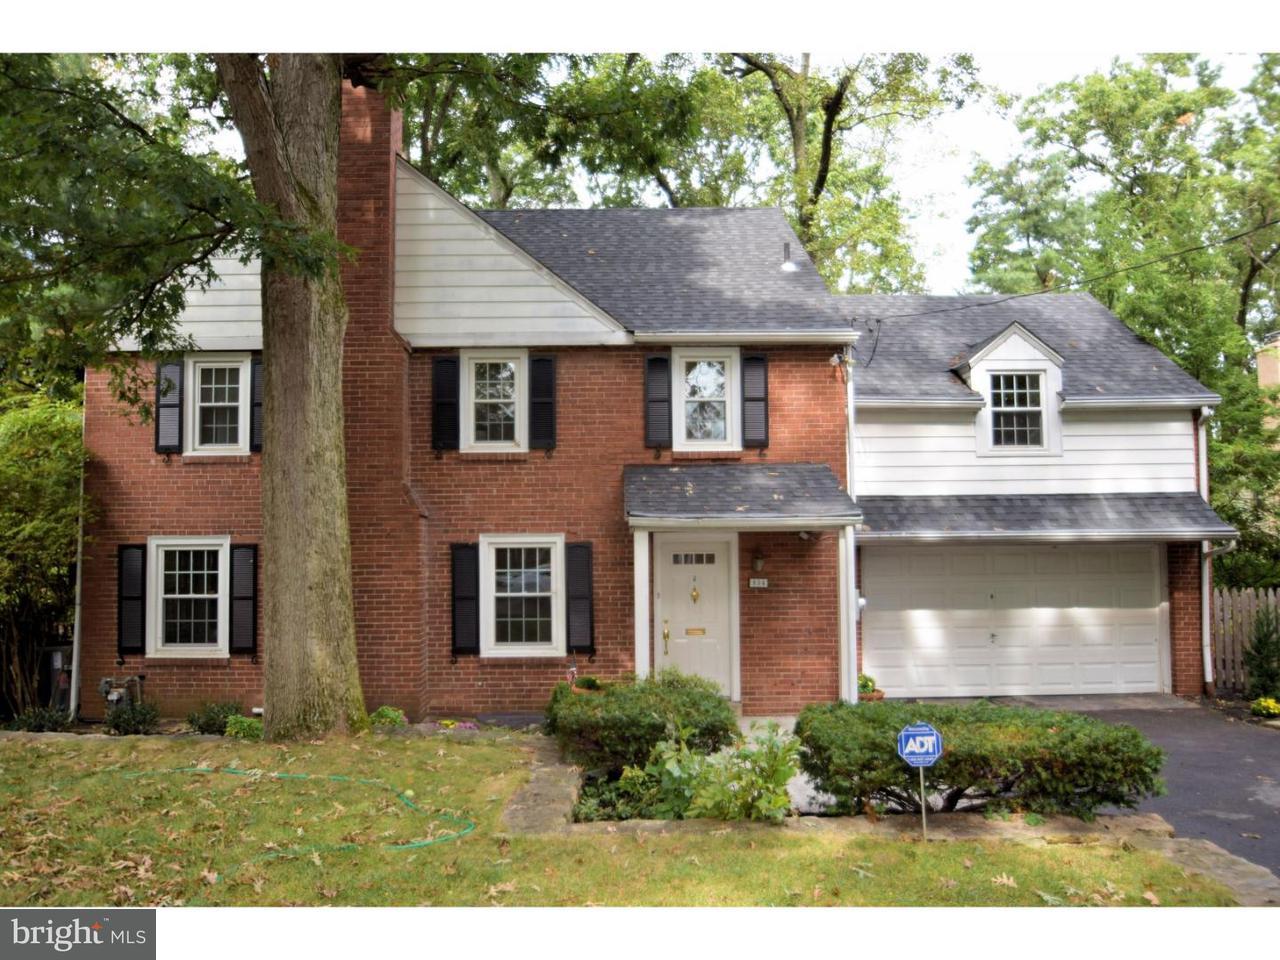 Single Family Home for Sale at 534 CUSTIS Road Glenside, Pennsylvania 19038 United States